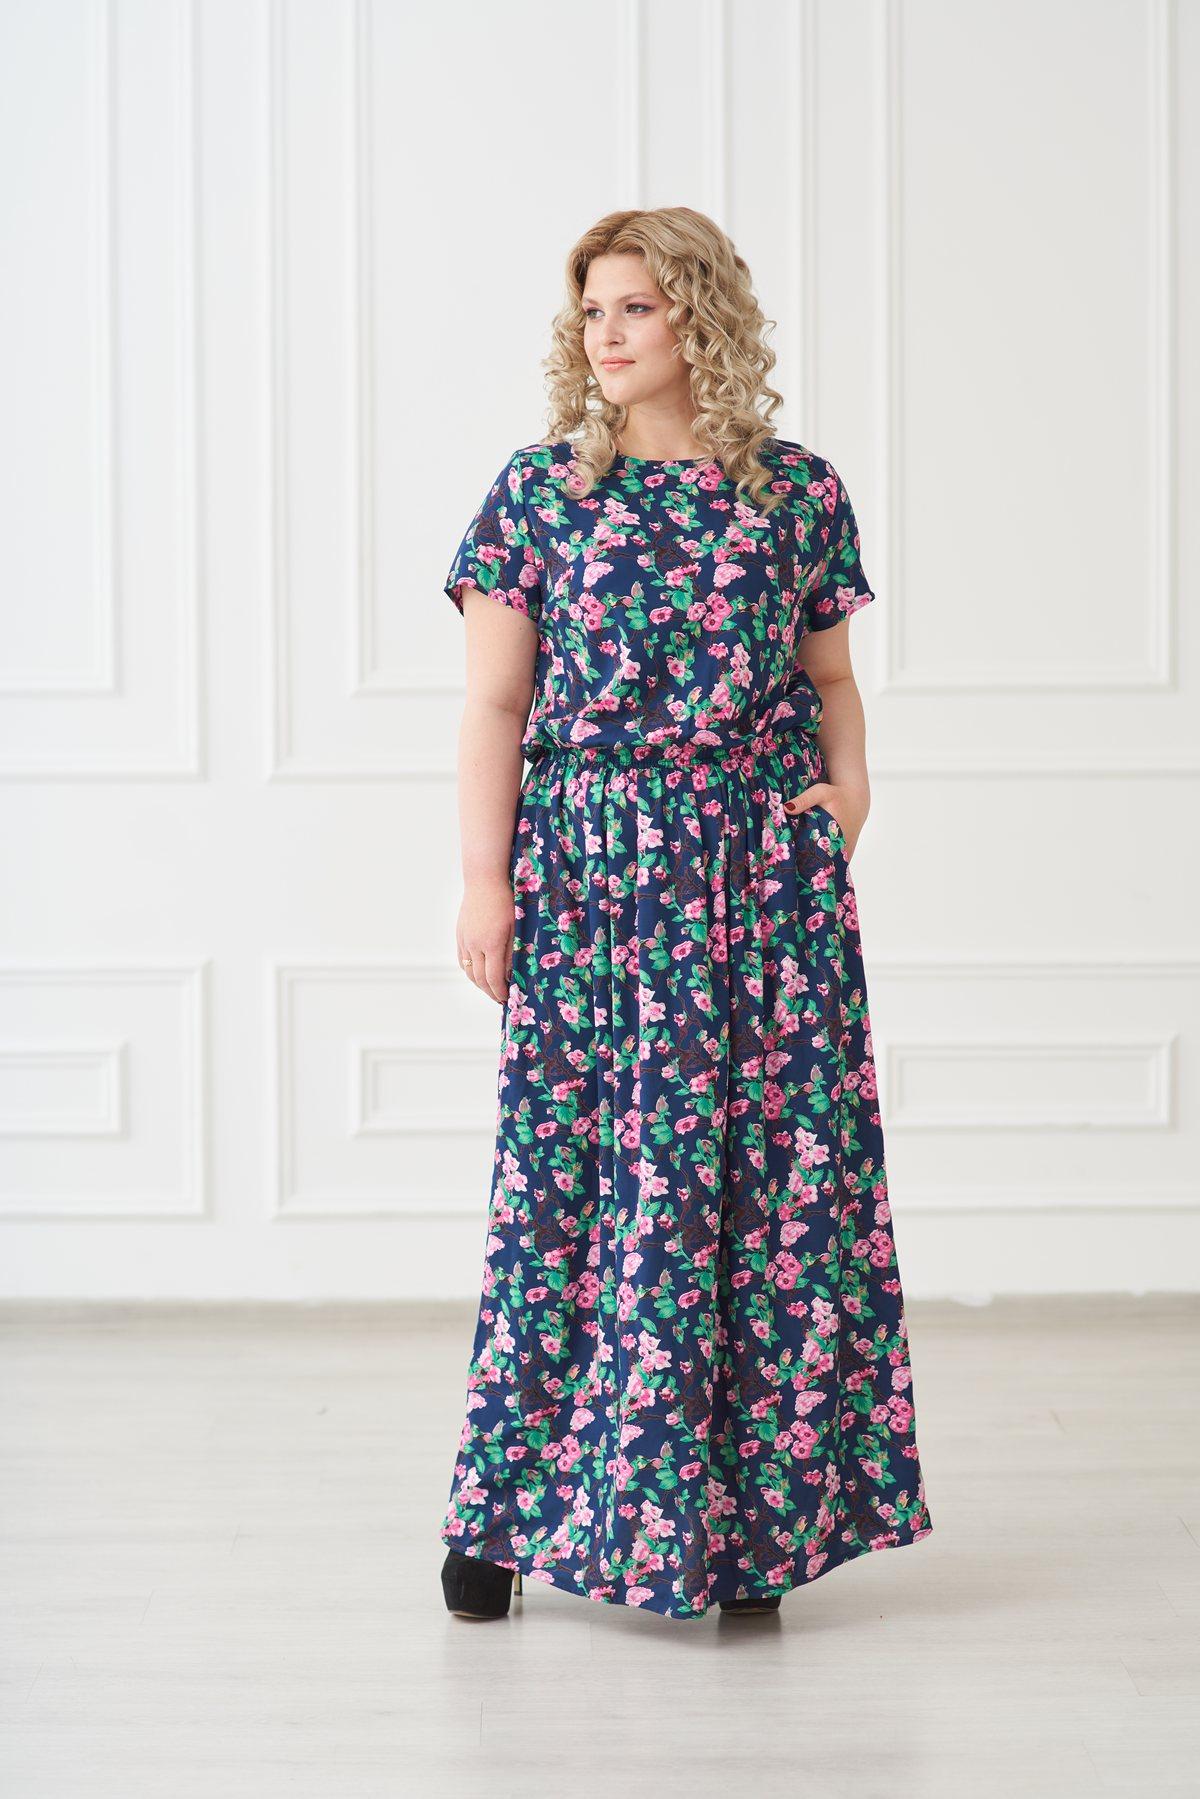 Жен. платье арт. 19-0140 Розочки р. 52Платья<br>Факт. ОГ: 114 см <br>Факт. ОТ: 82 см <br>Факт. ОБ: 136 см <br>Длина по спинке: 146 см<br><br>Тип: Жен. платье<br>Размер: 52<br>Материал: Штапель